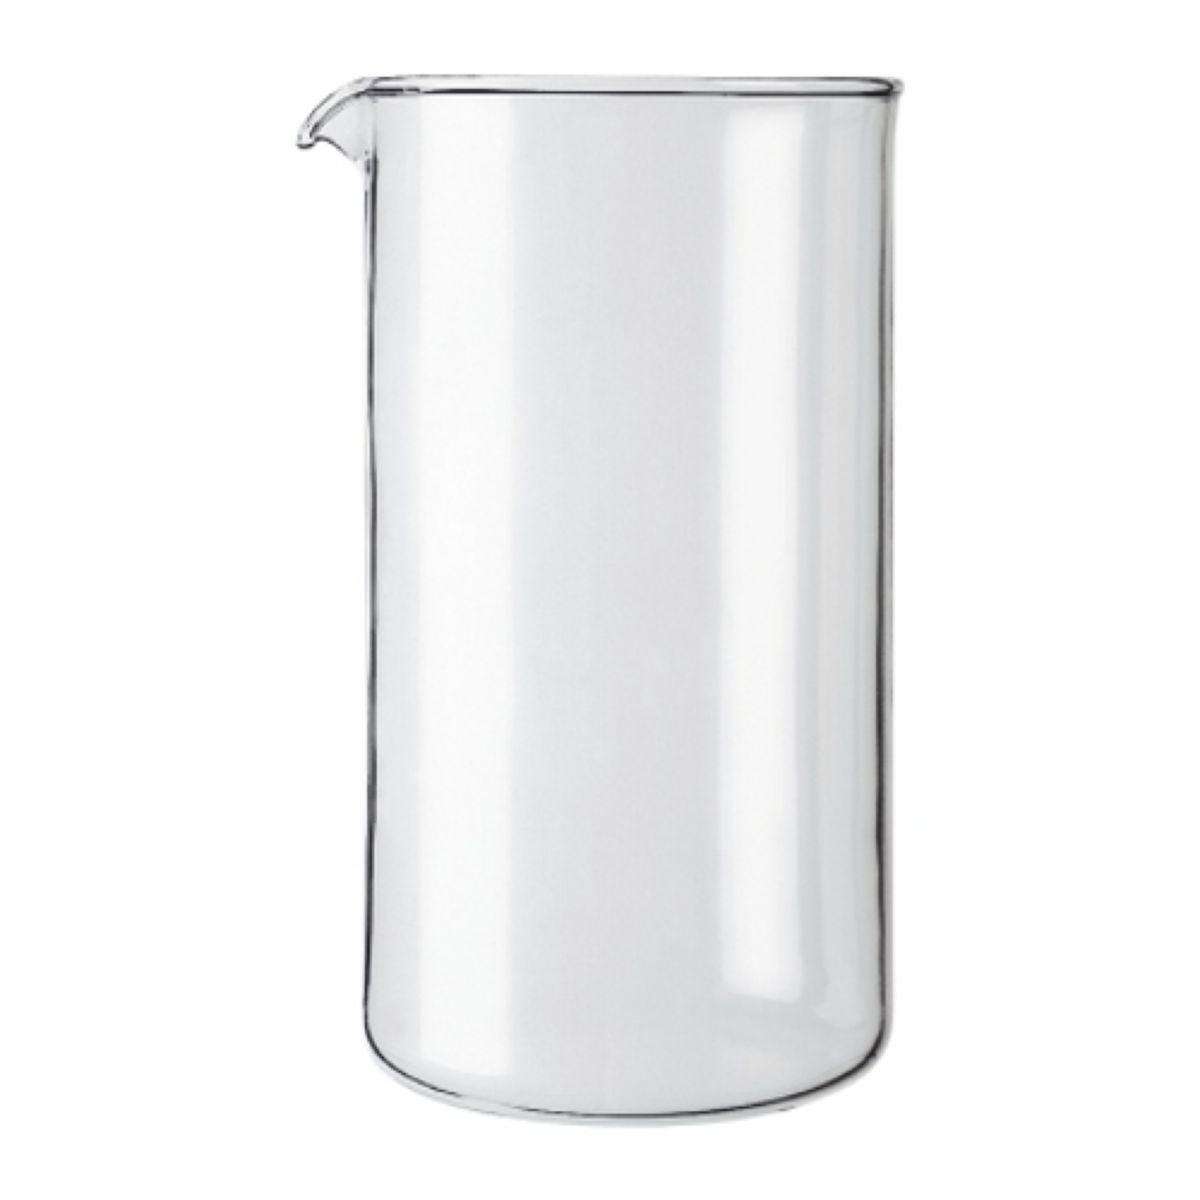 Bodum 8-Cup Spare Glass